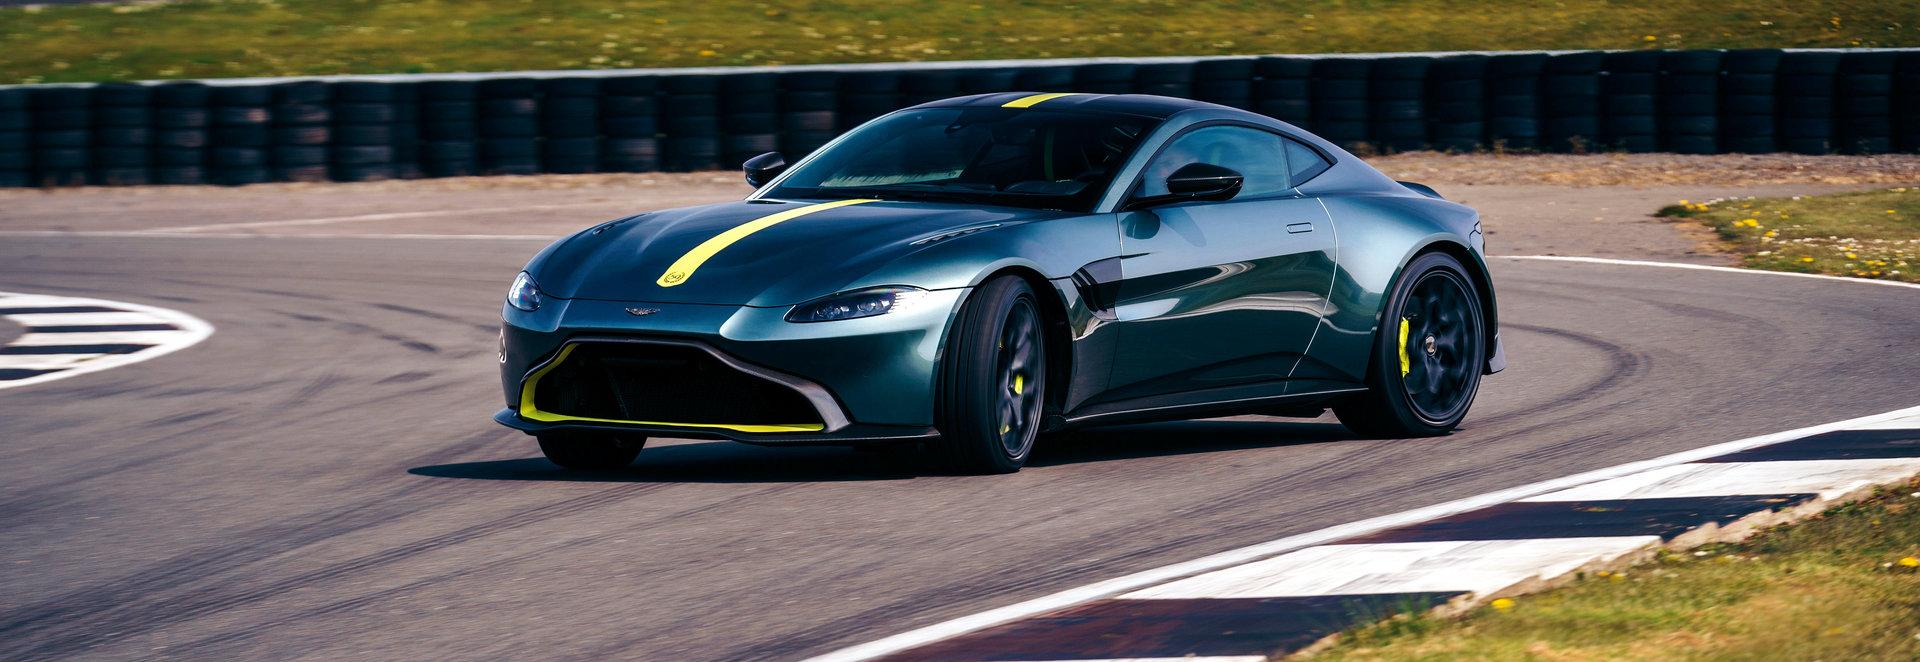 Aston Martin Vantage AMR, un deportivo a la vieja usanza